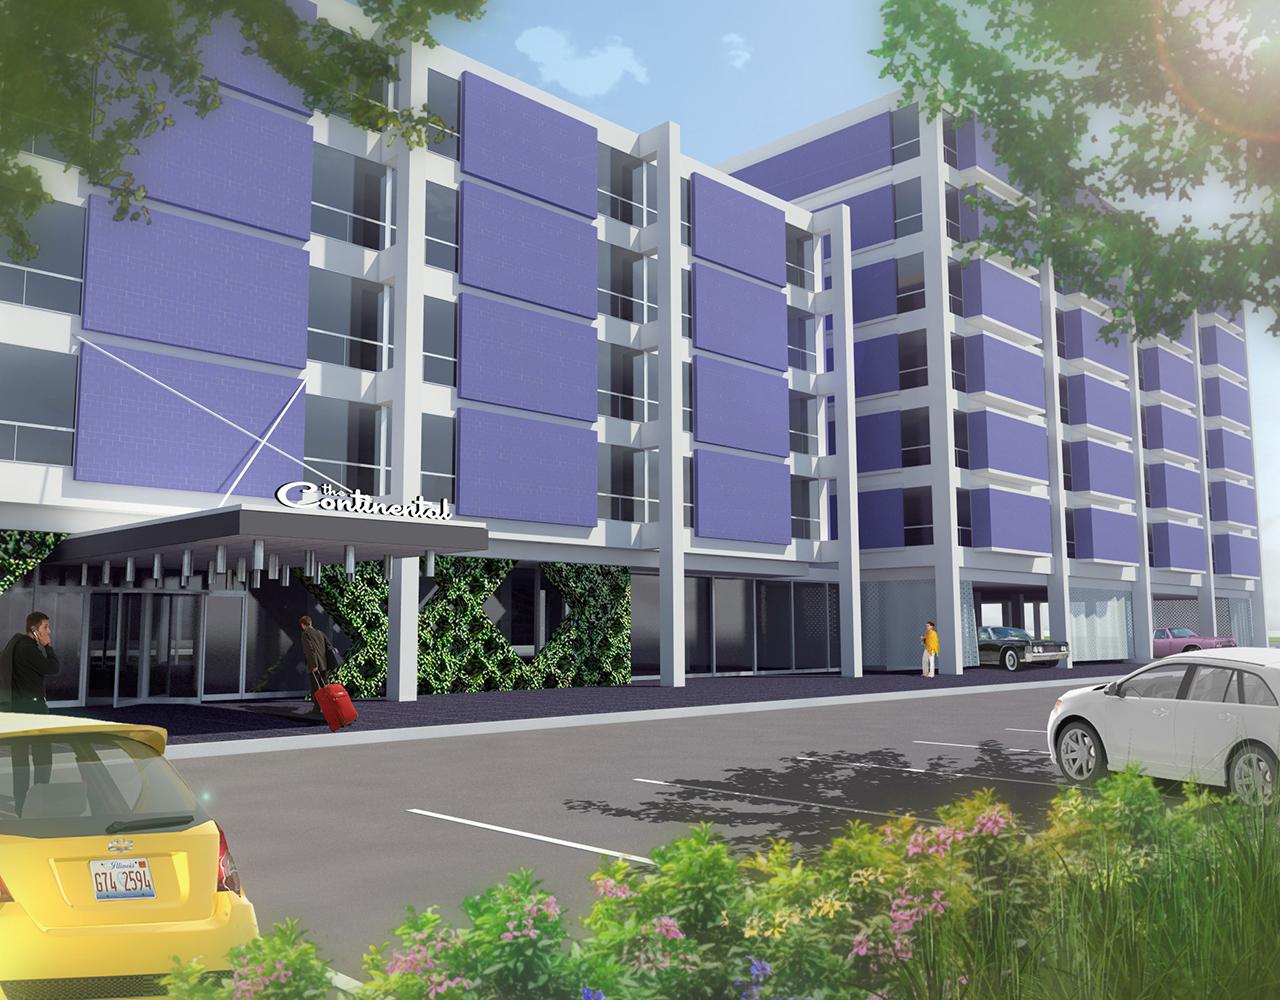 projects the purple hotel - Purple Hotel 2016